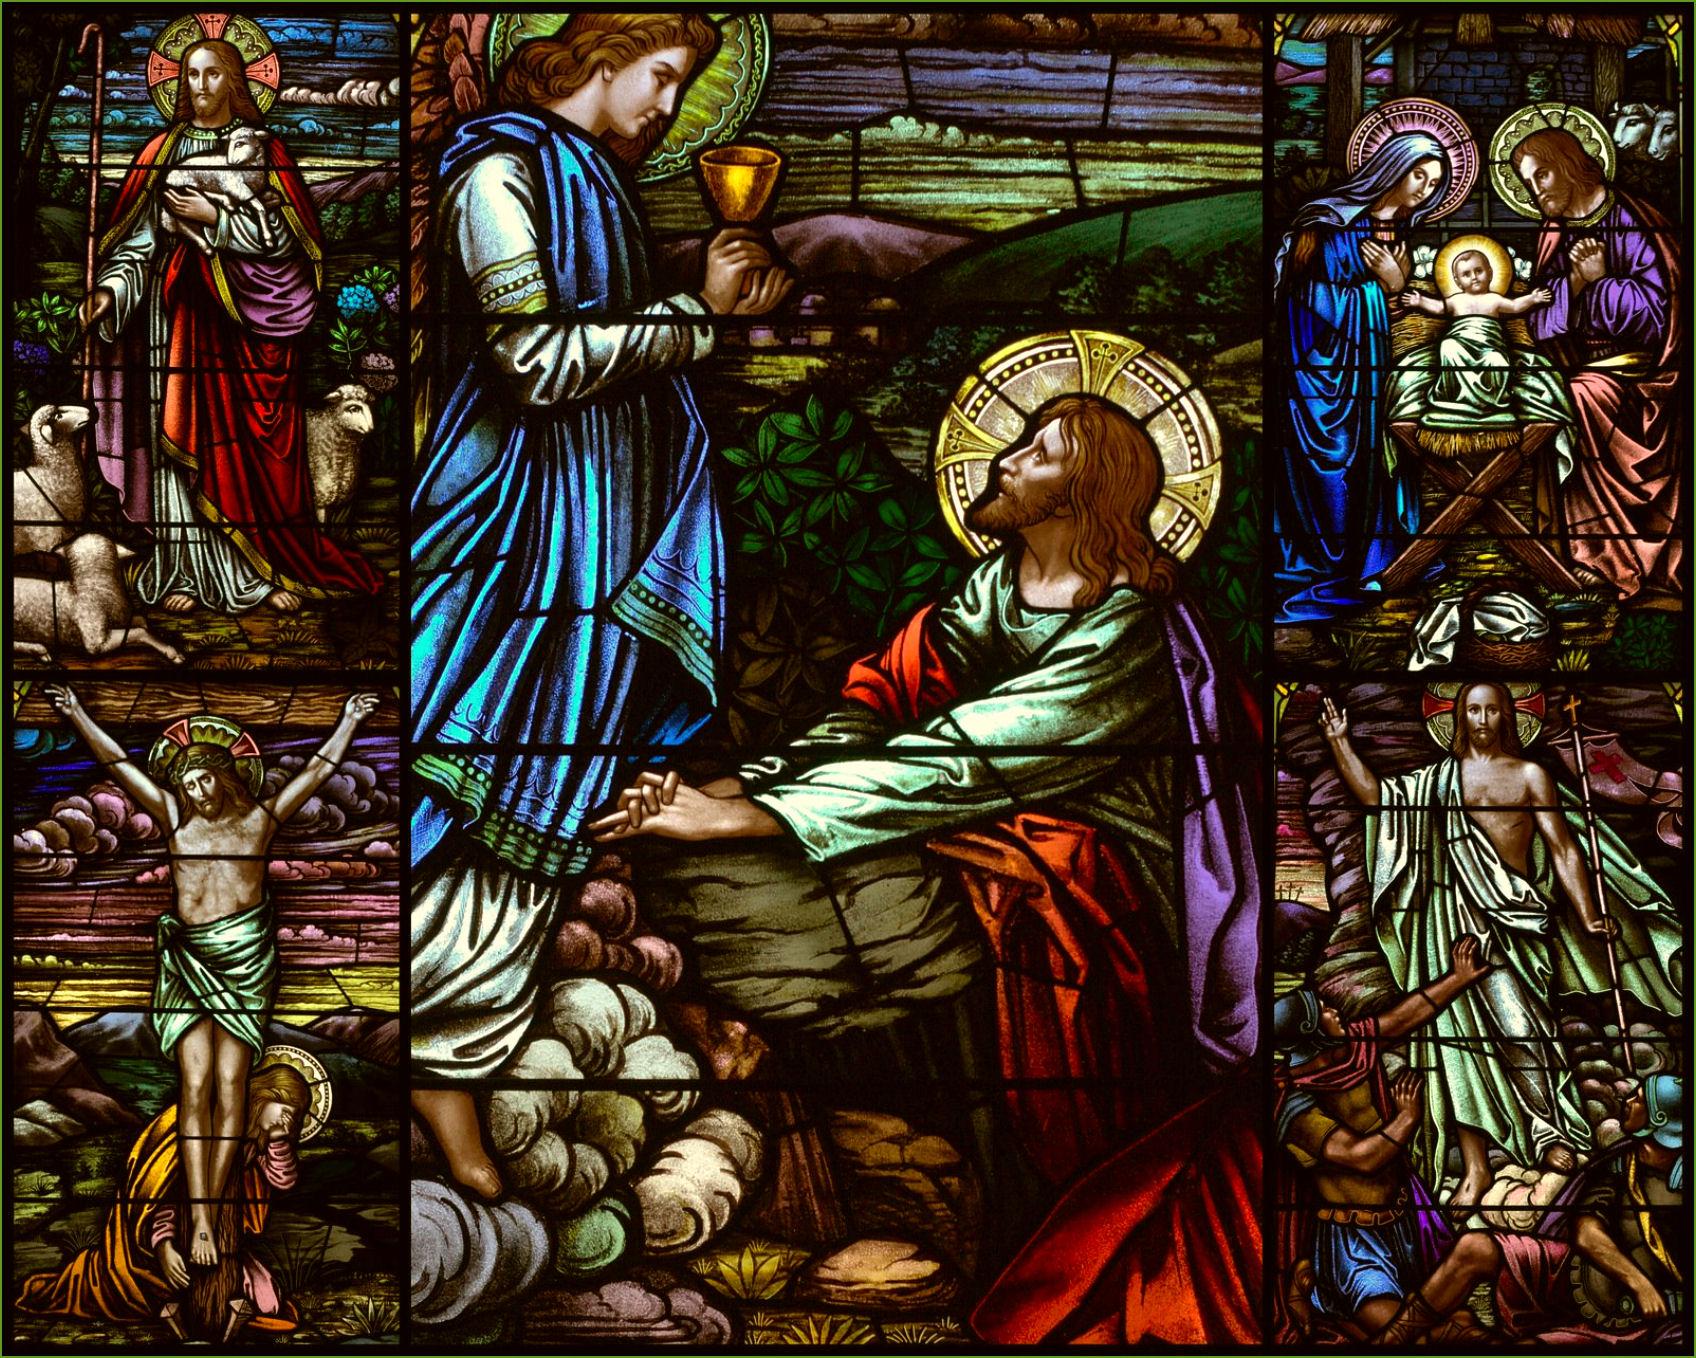 stained glass jesus catholic christian art wallpaper background 1696x1358